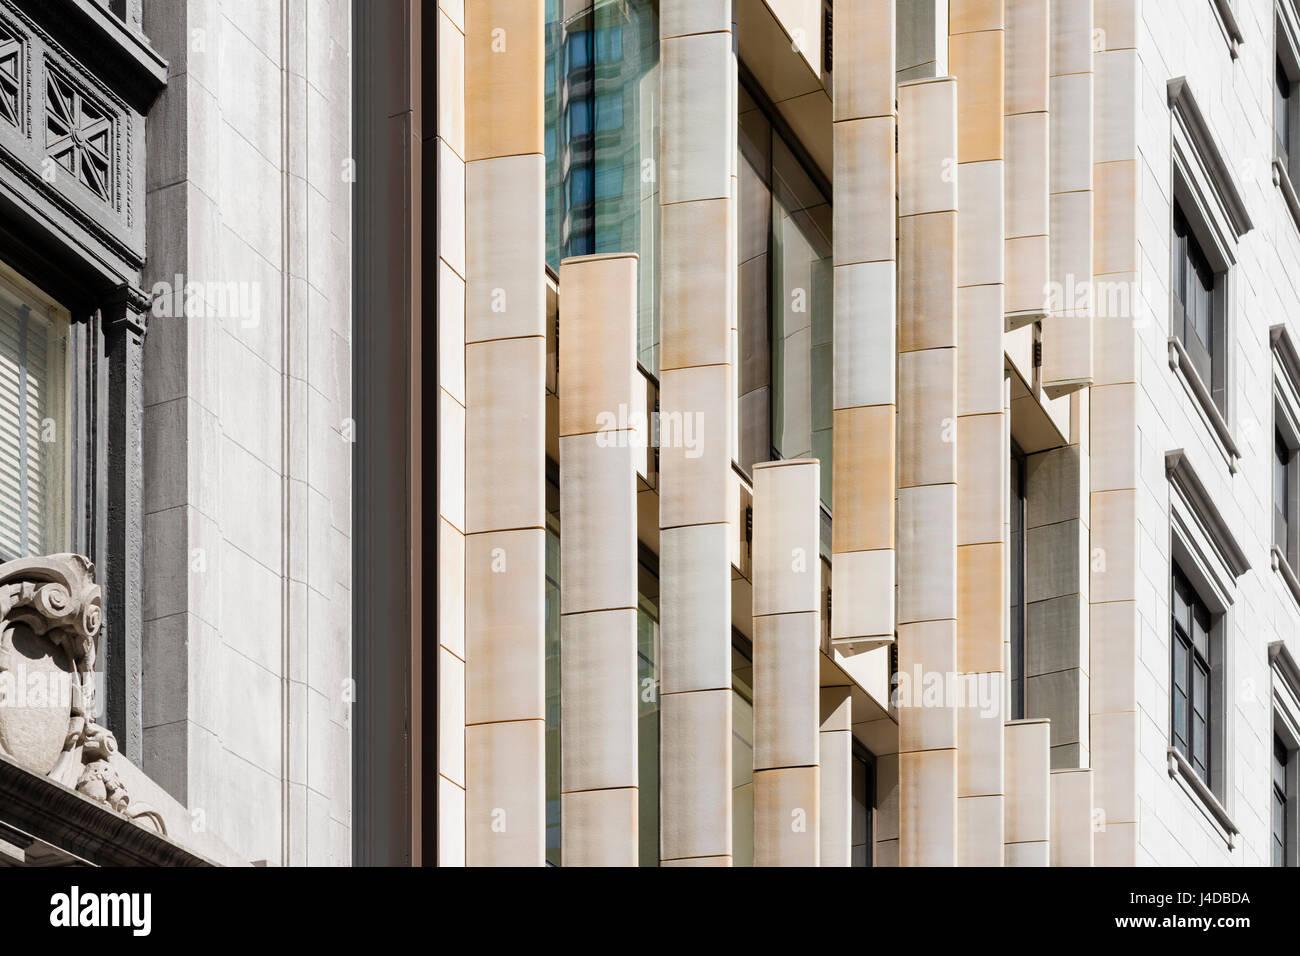 Detail Of Vertical Terracotta Fins Including Neighboring